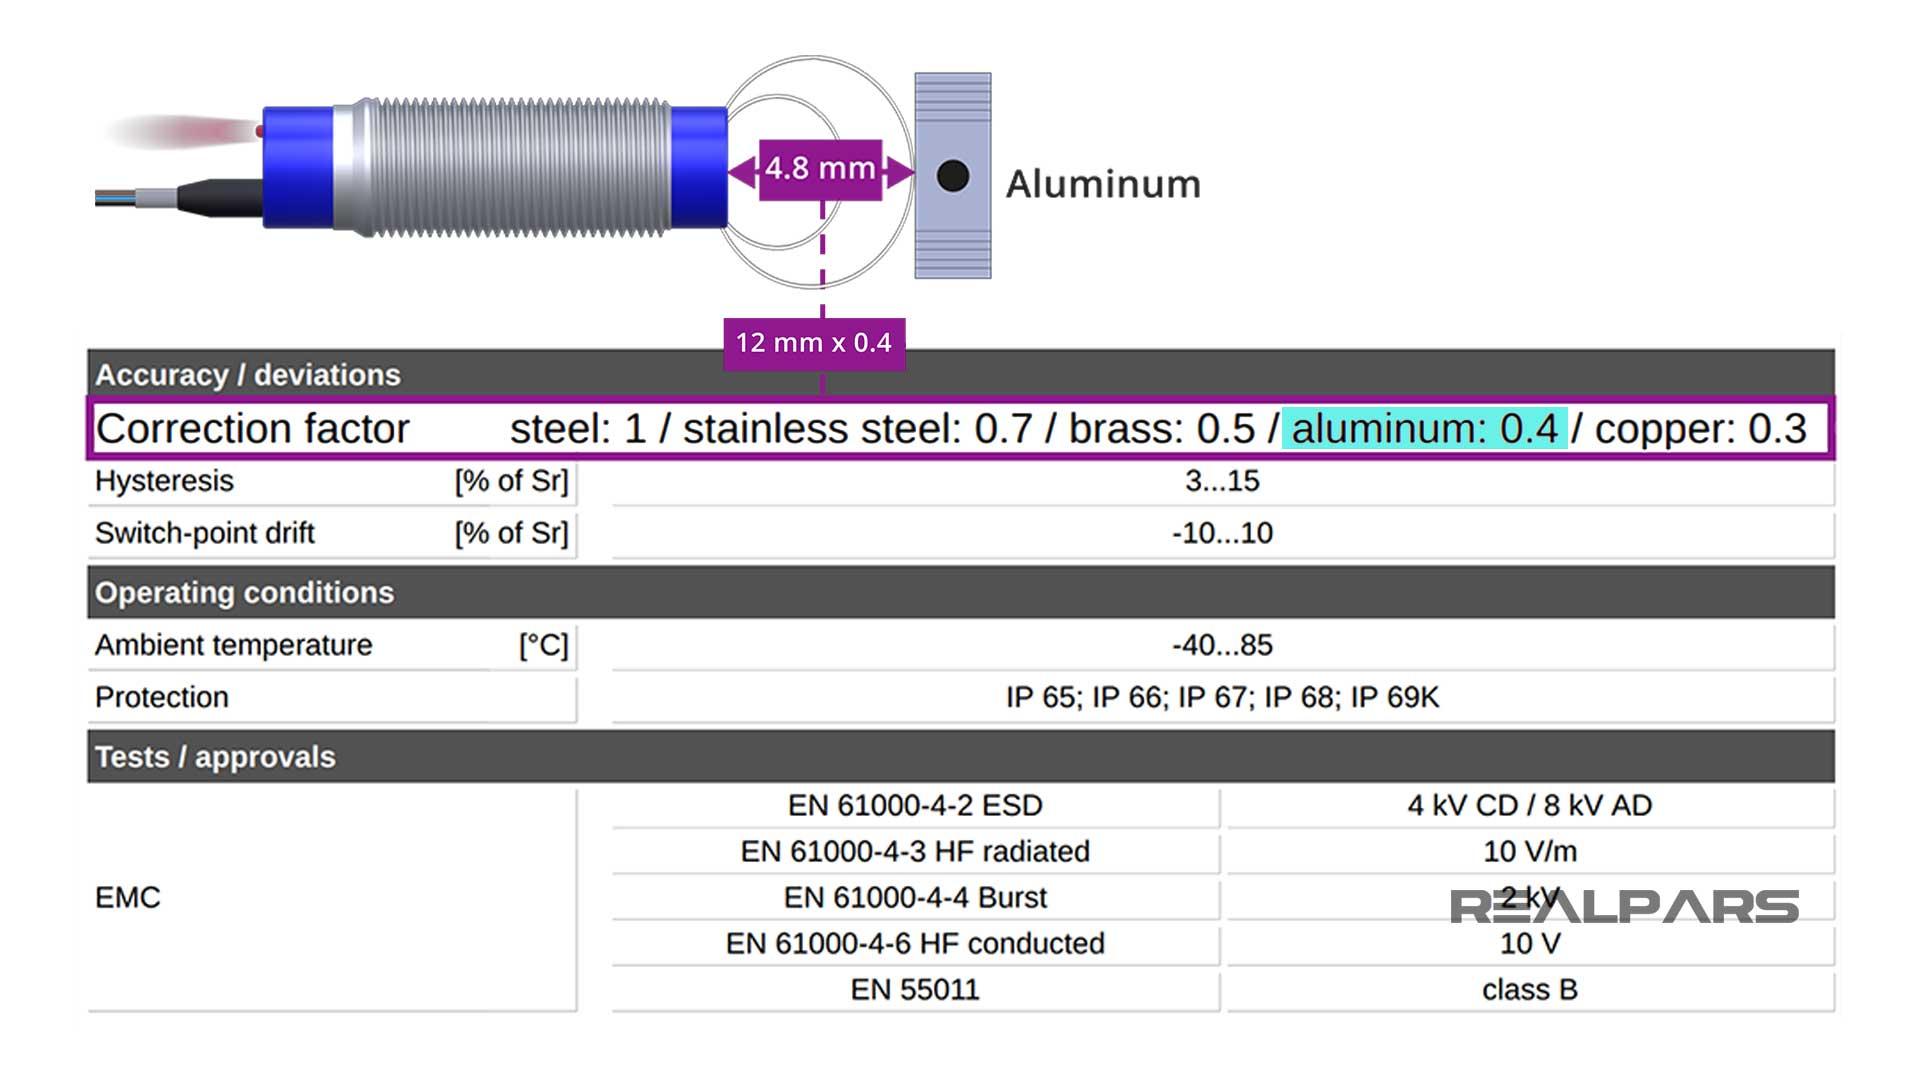 Aluminum_ Correction Factor